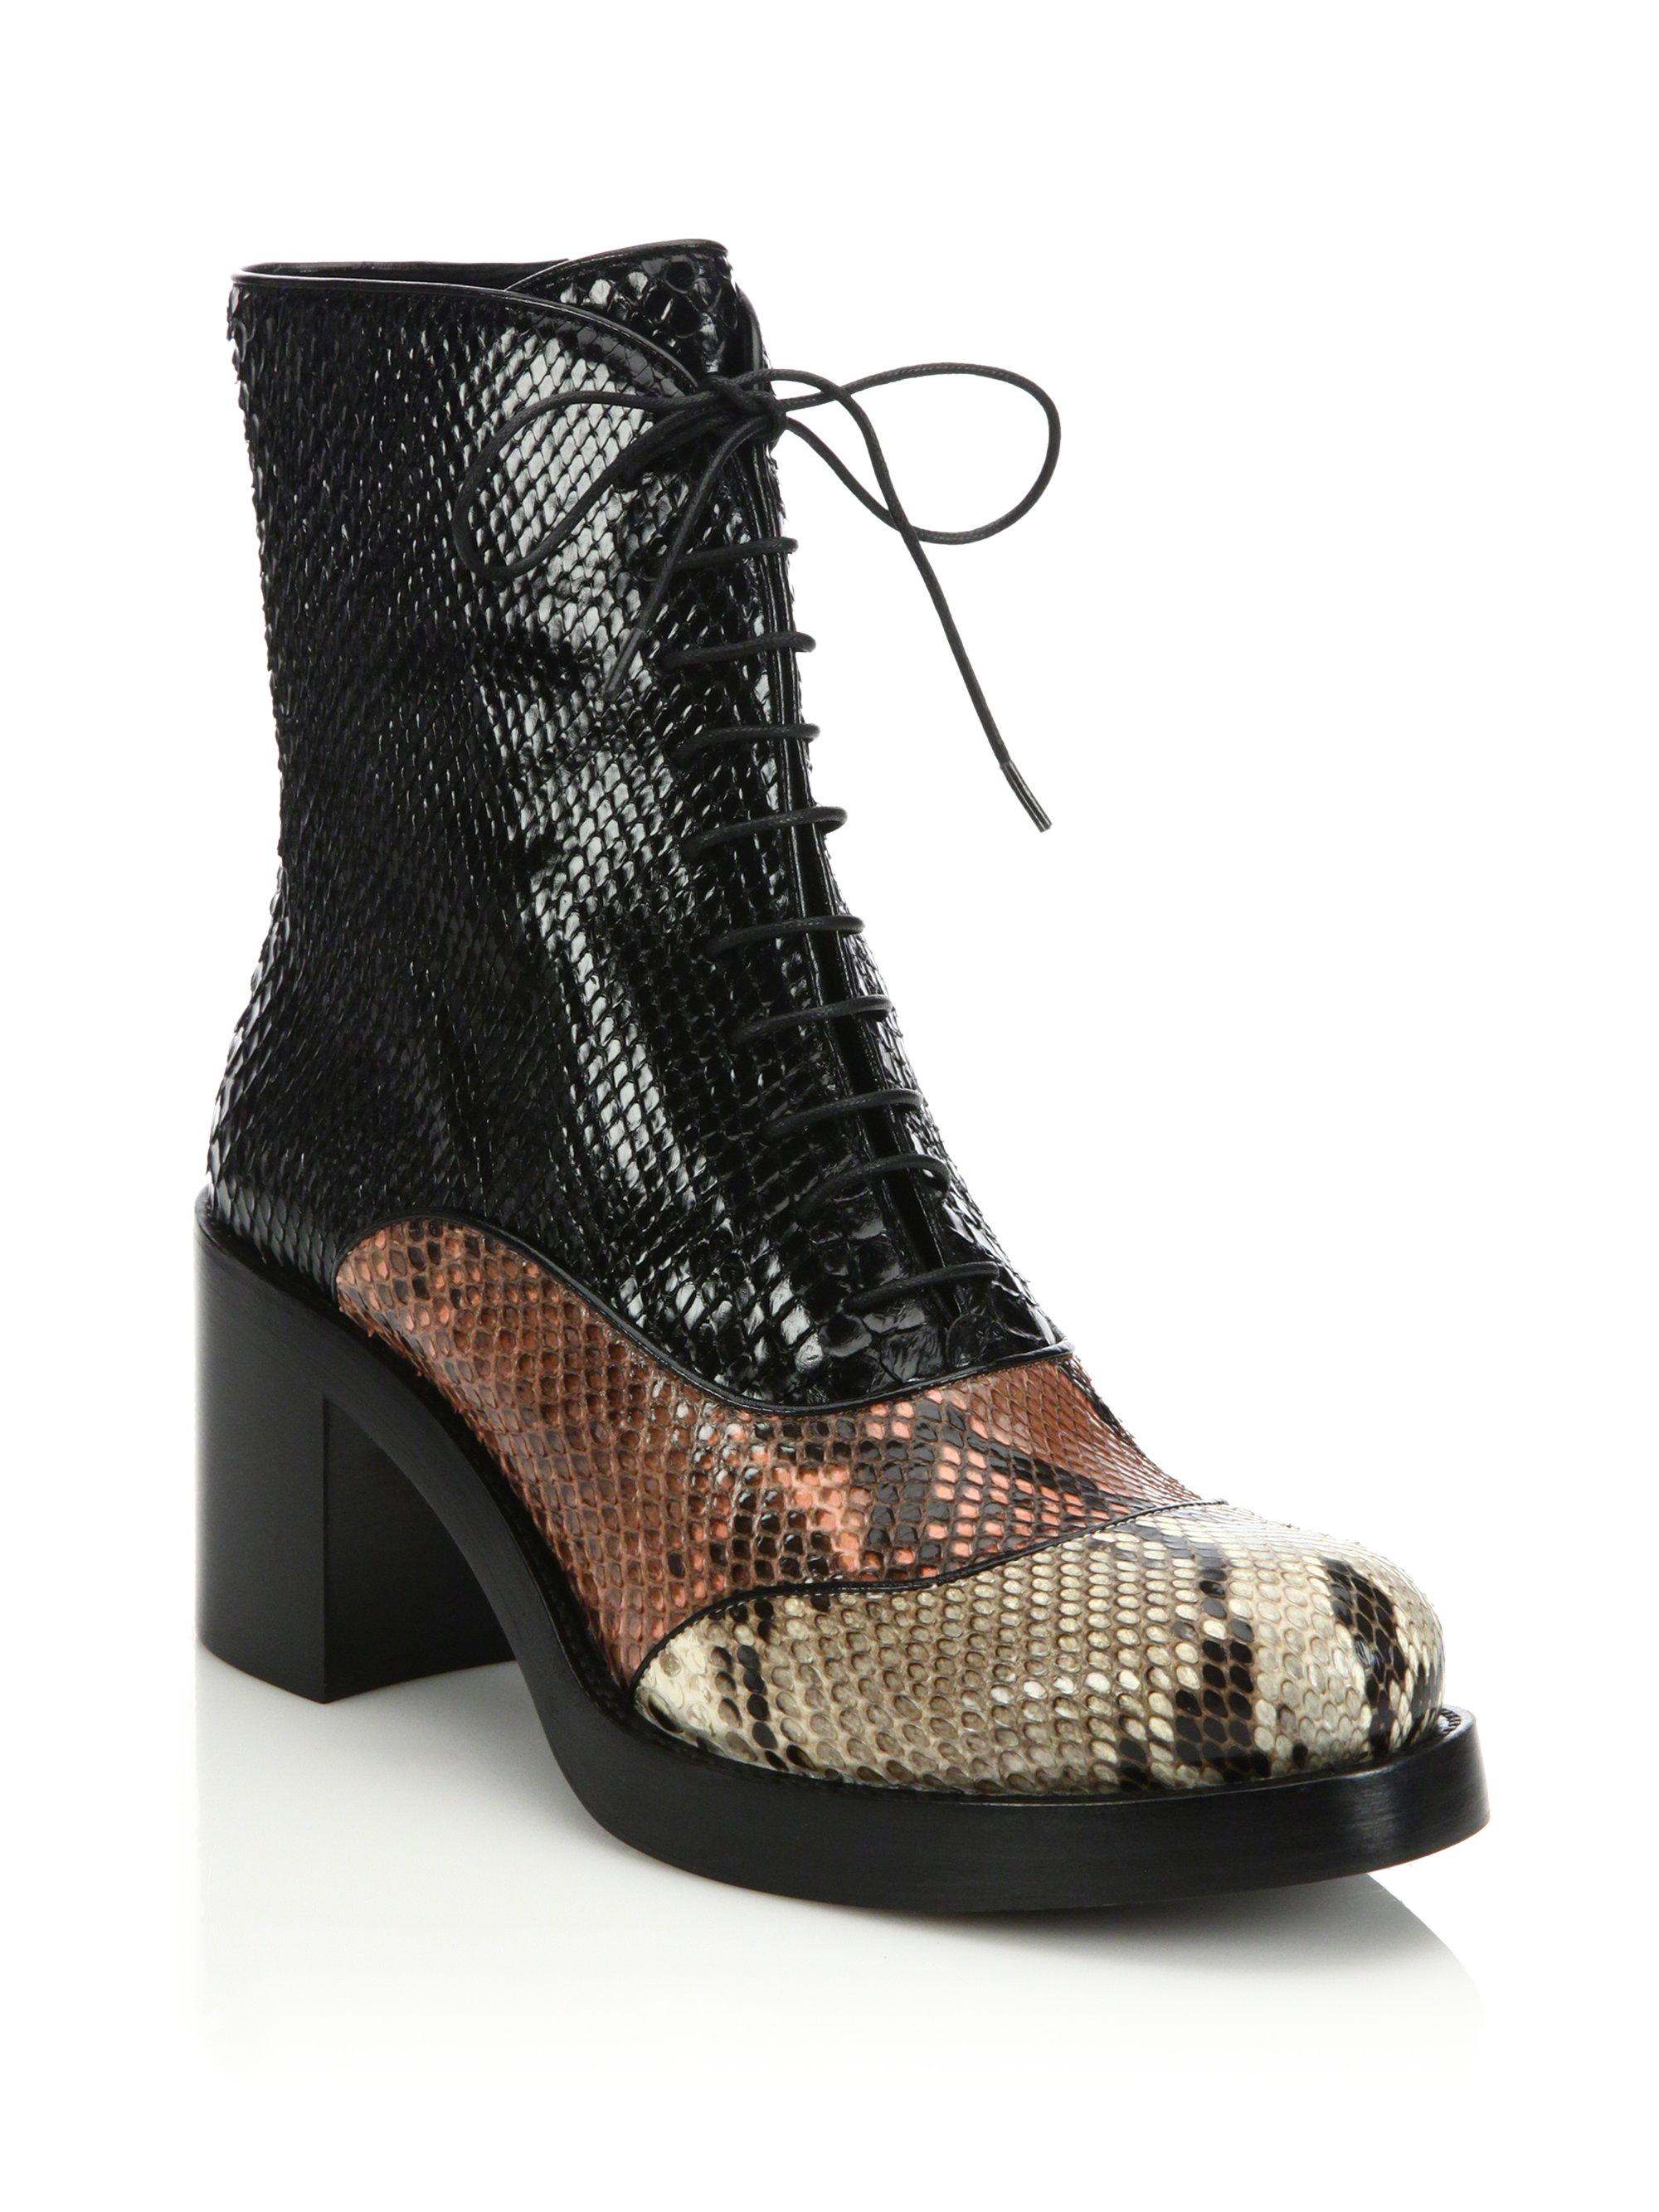 Miu Miu Grey Velvet Boots 7jC9q0Gl